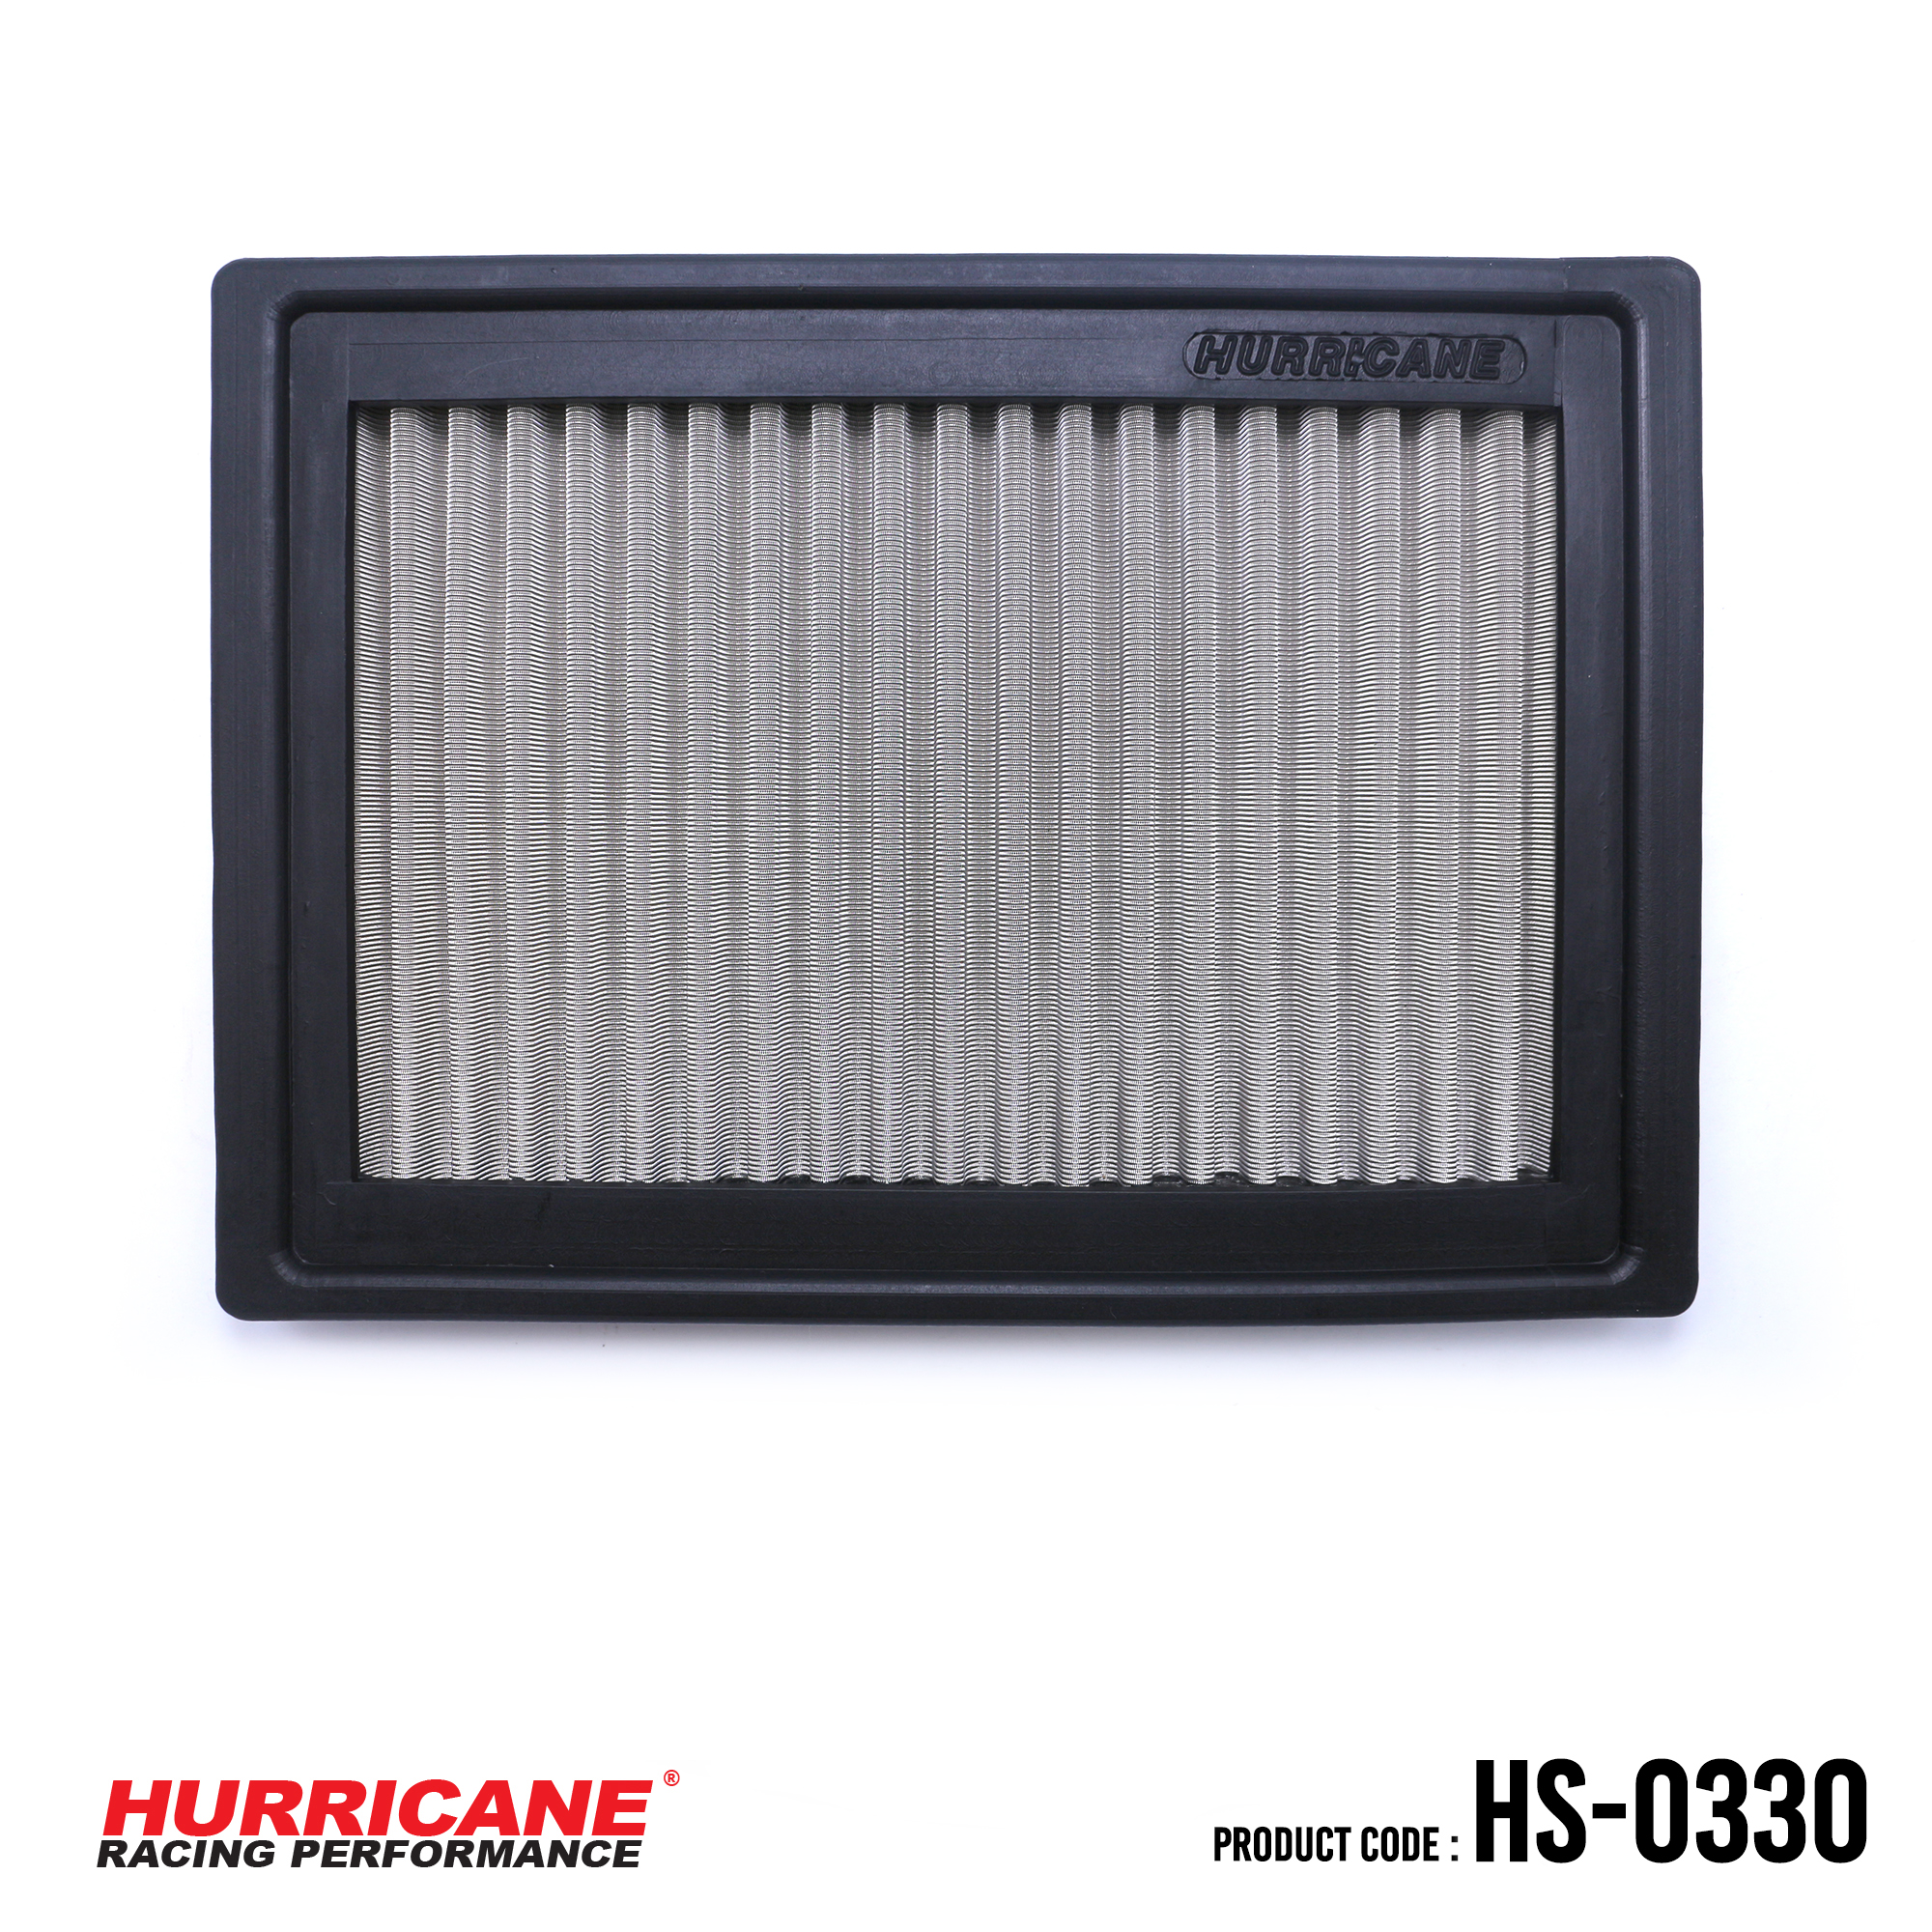 HURRICANE STAINLESS STEEL AIR FILTER FOR HS-0330 Chevrolet